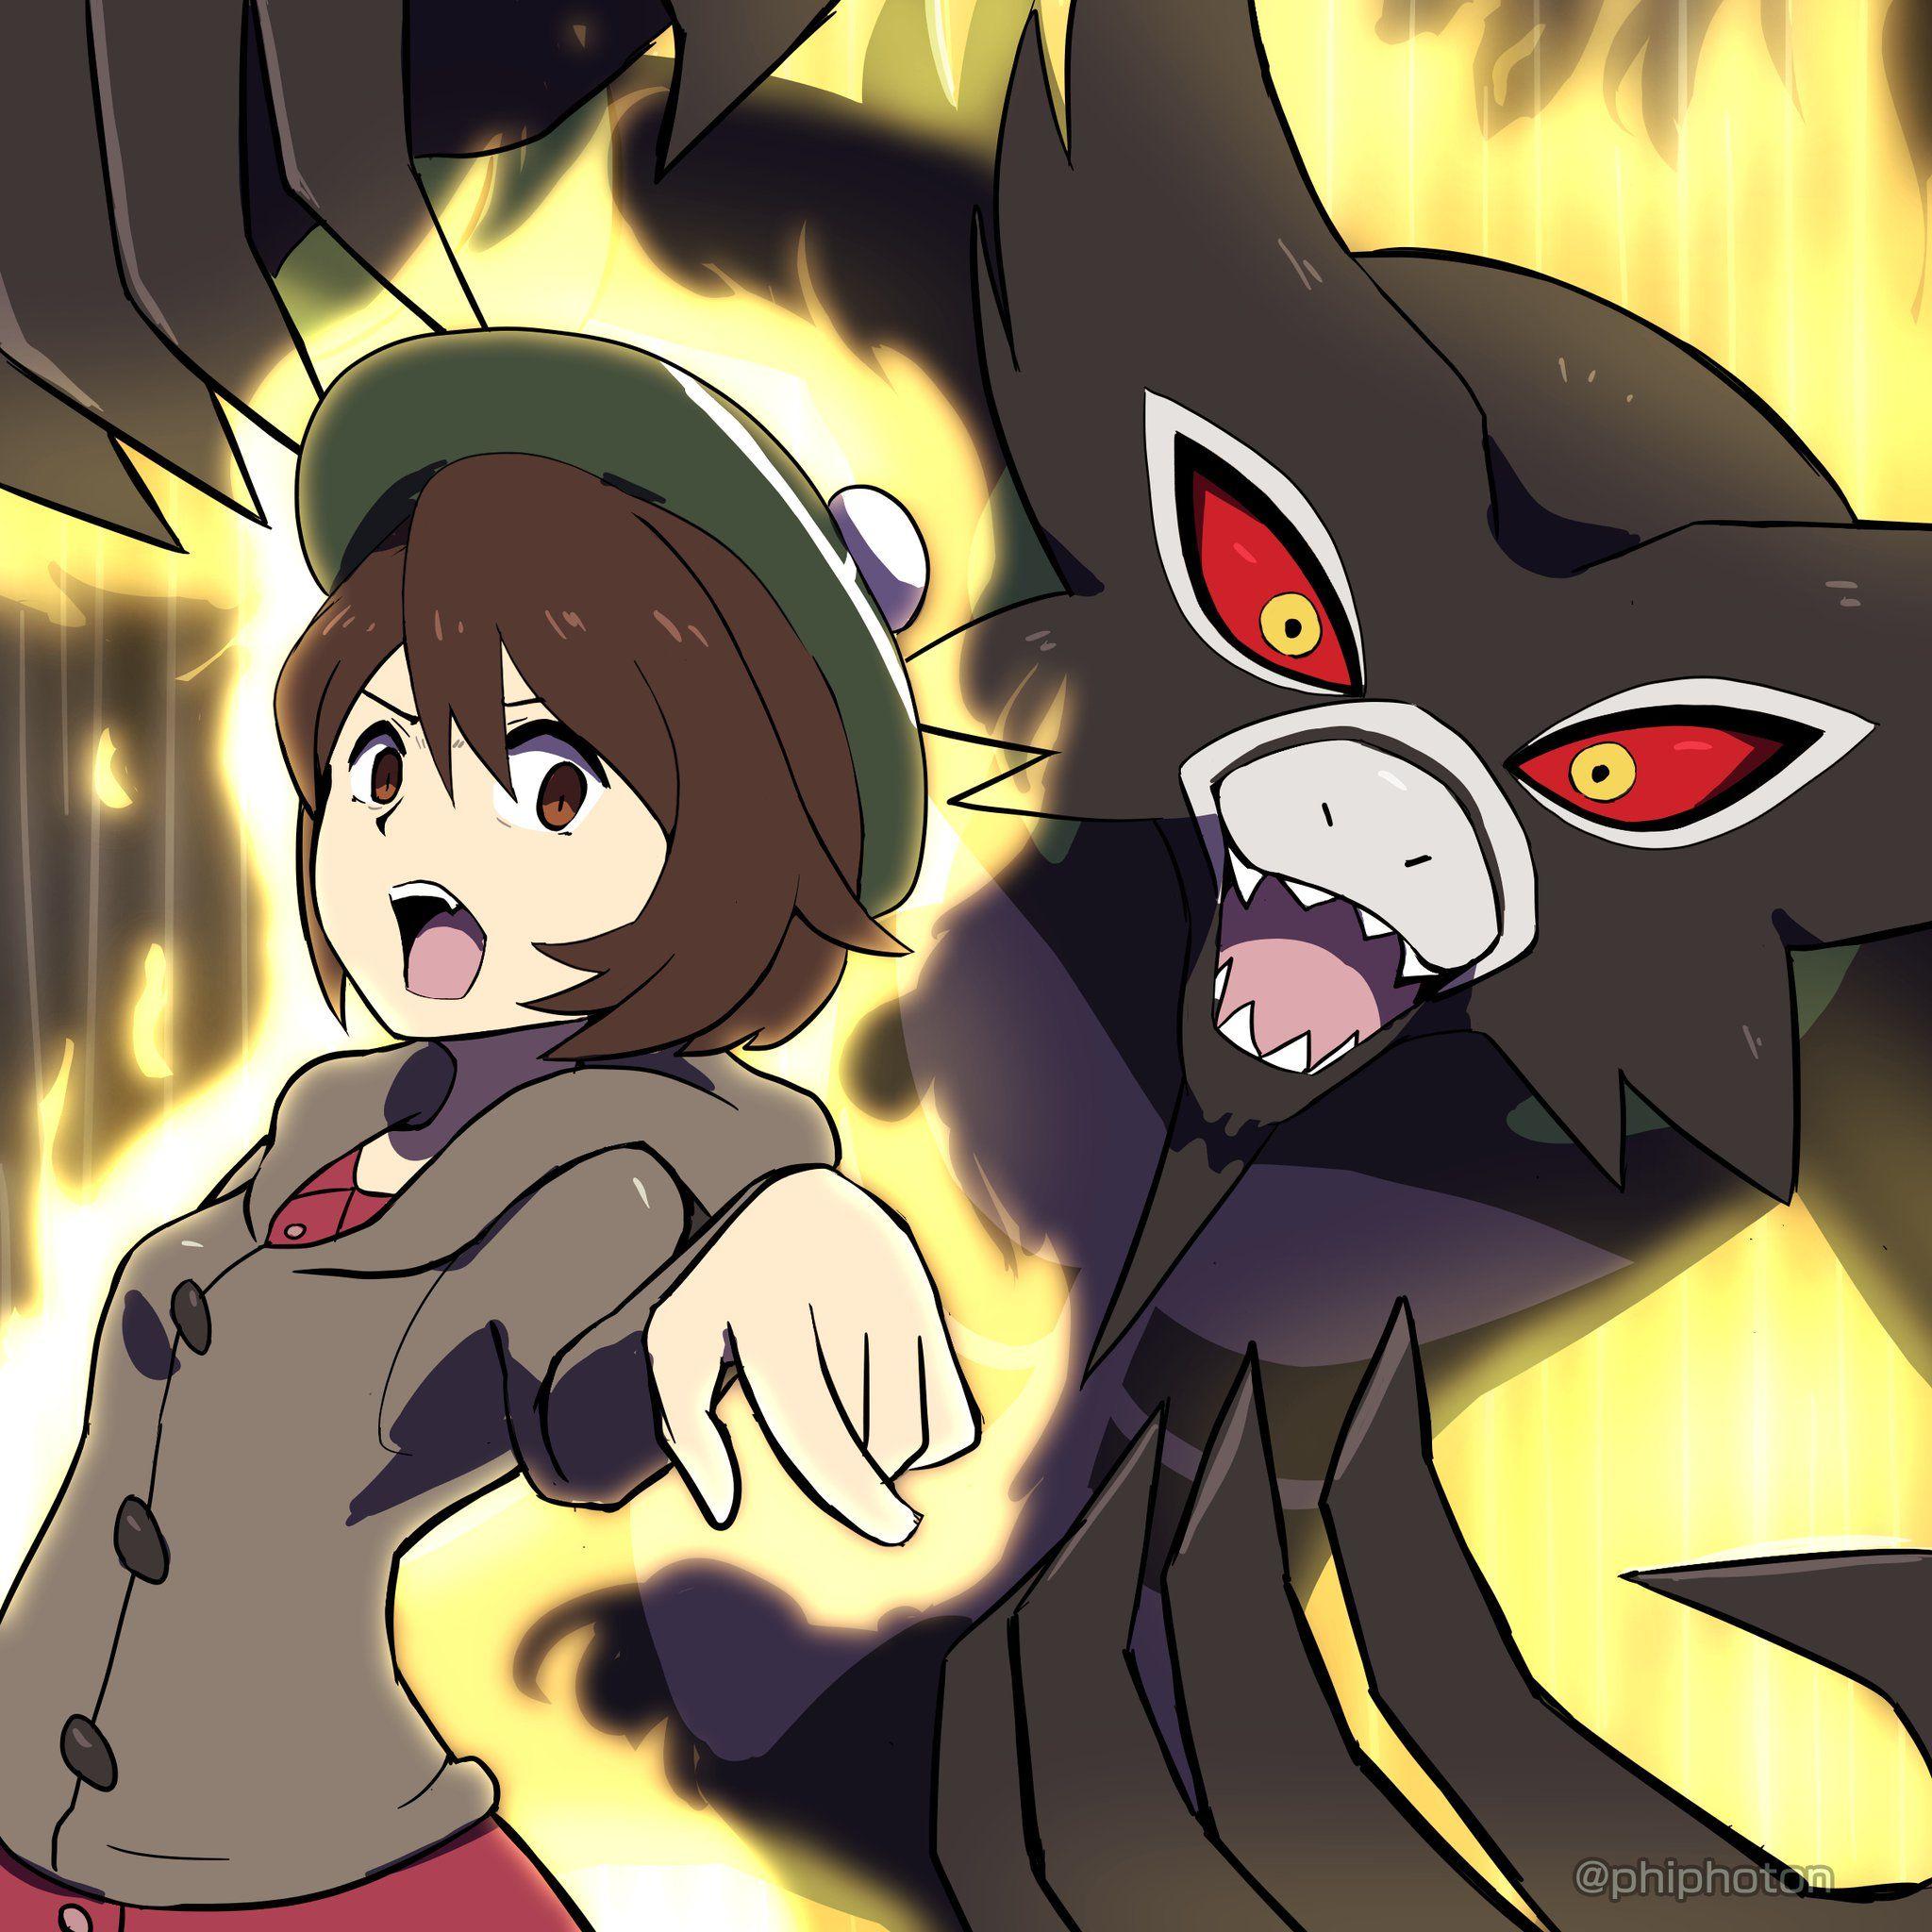 Phiphi on Anime, Japanese names, Pokemon